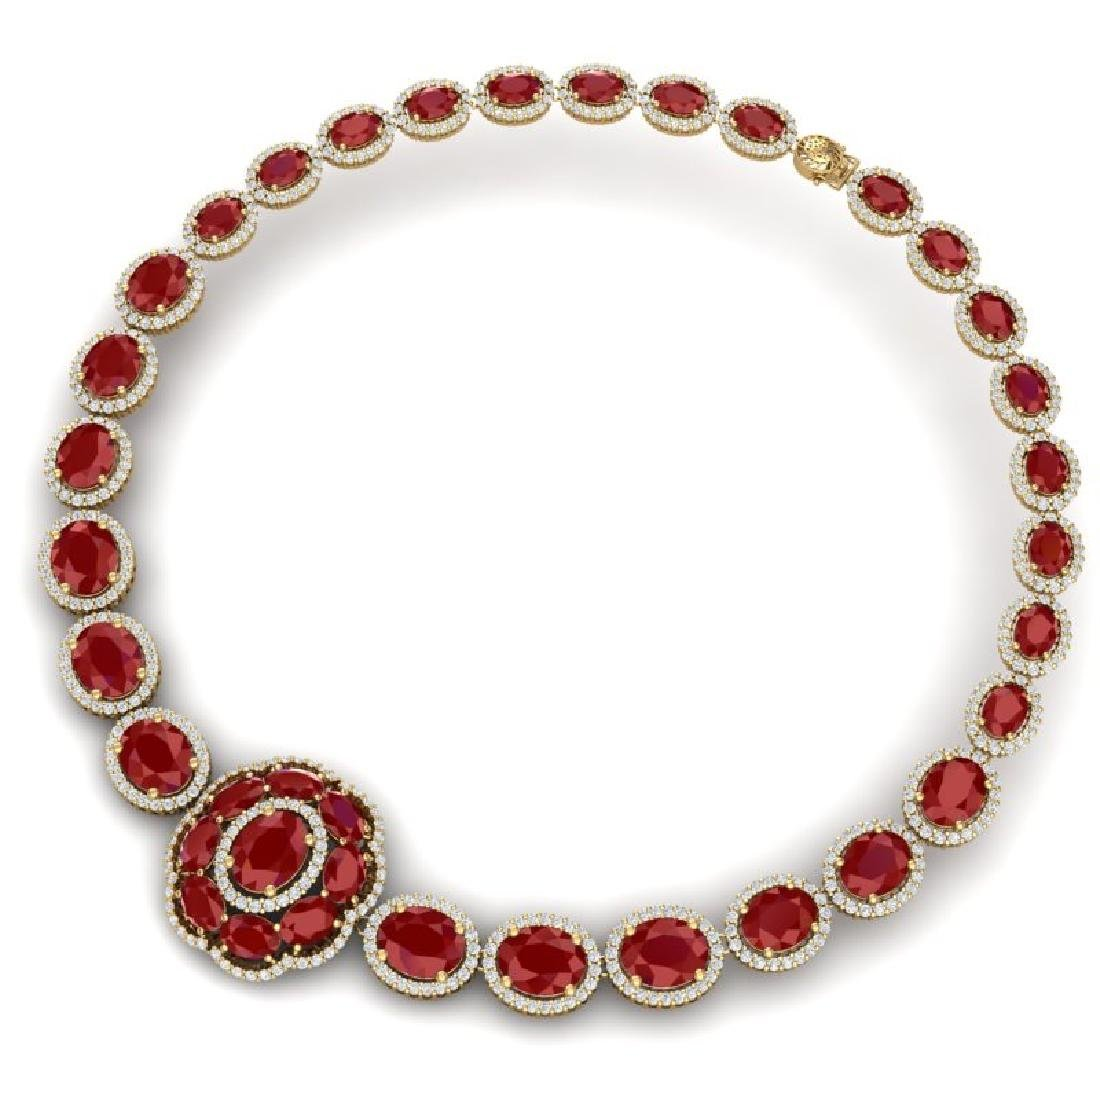 58.33 CTW Royalty Ruby & VS Diamond Necklace 18K Yellow - 3